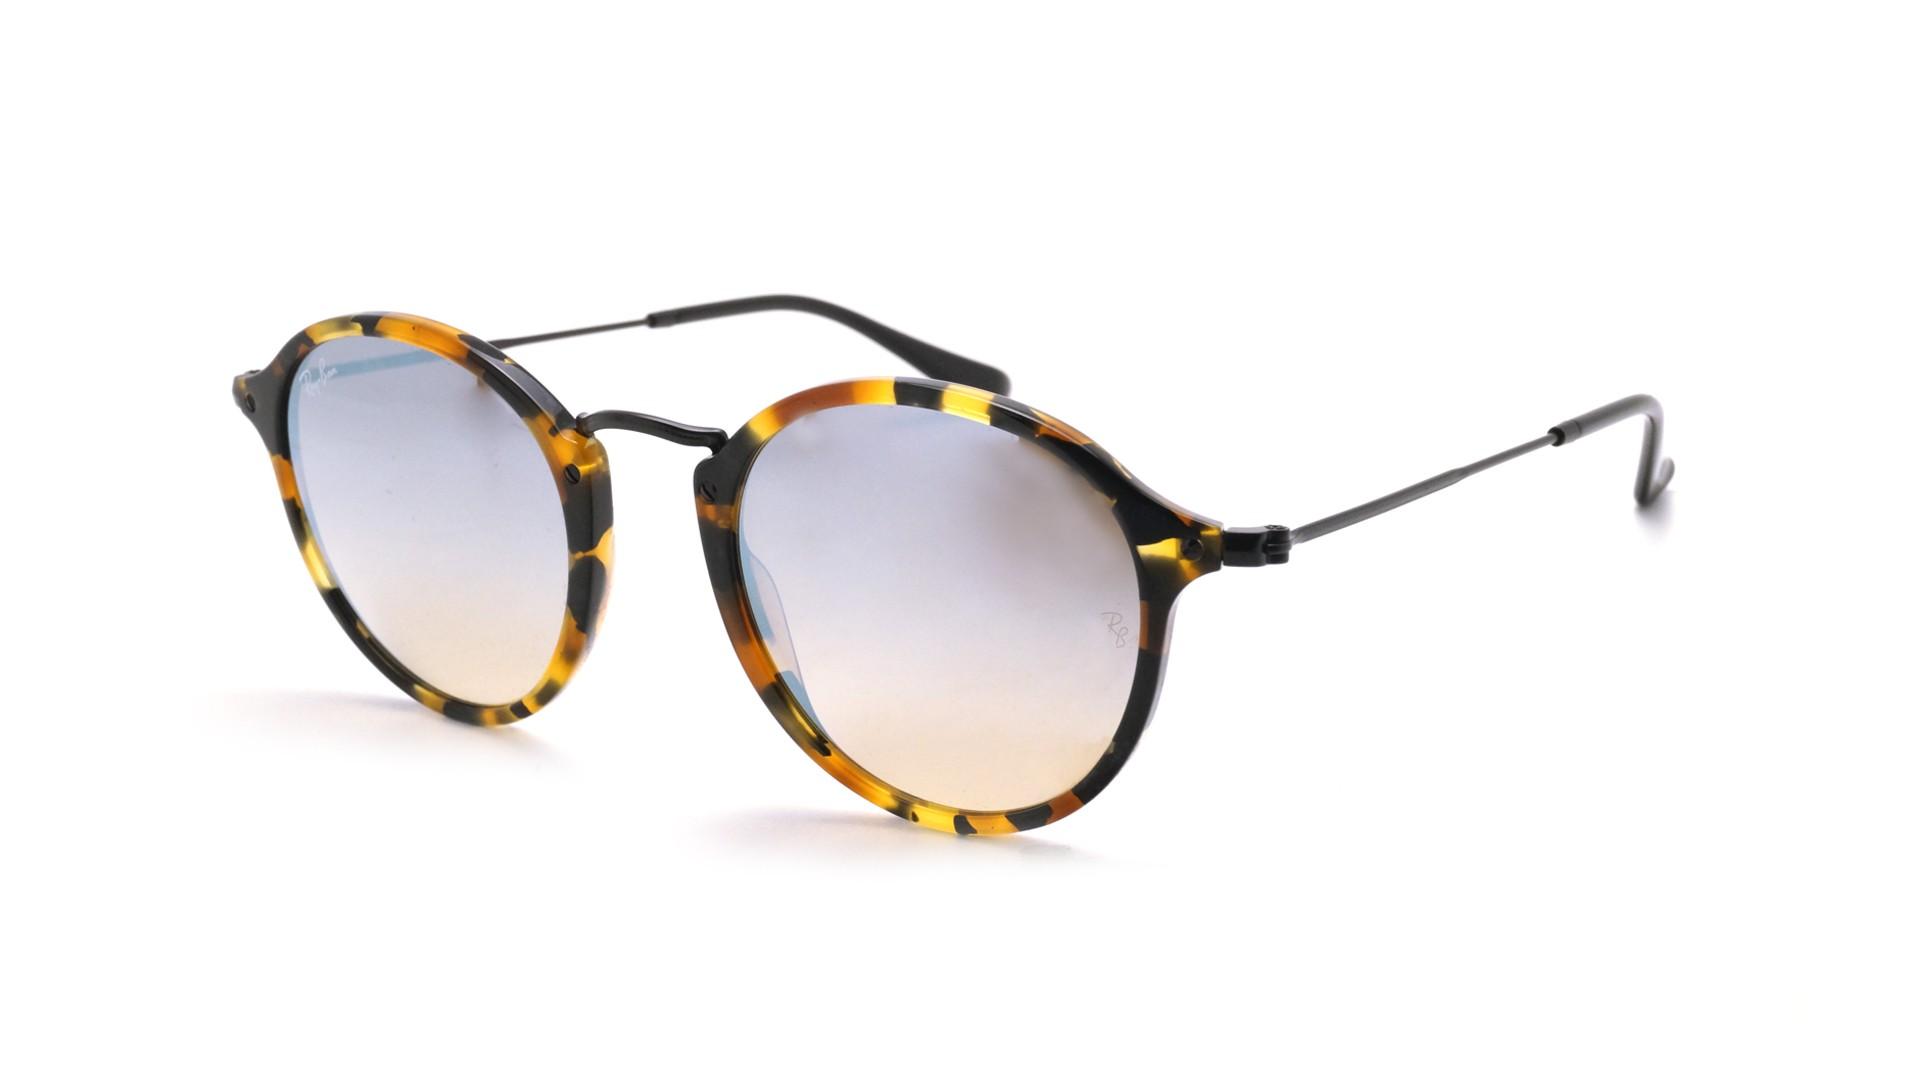 fa858ff0e5 Sunglasses Ray-Ban Round Tortoise RB2447 1157 9U 49-21 Medium Gradient  Mirror